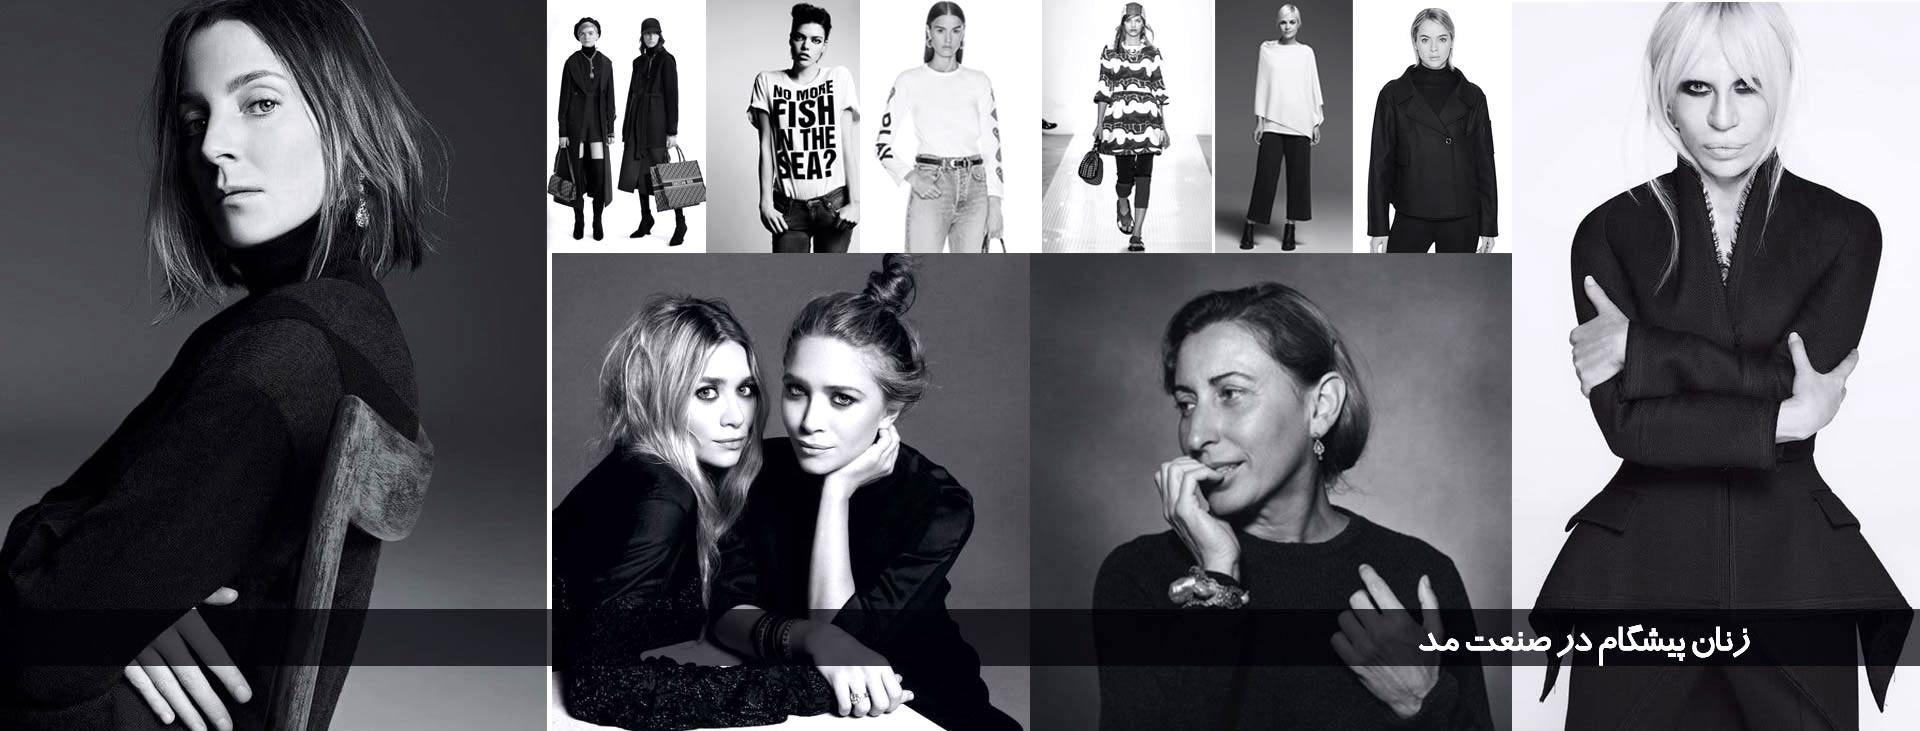 Women Designers 11 - زنان پیشگام در صنعت مد